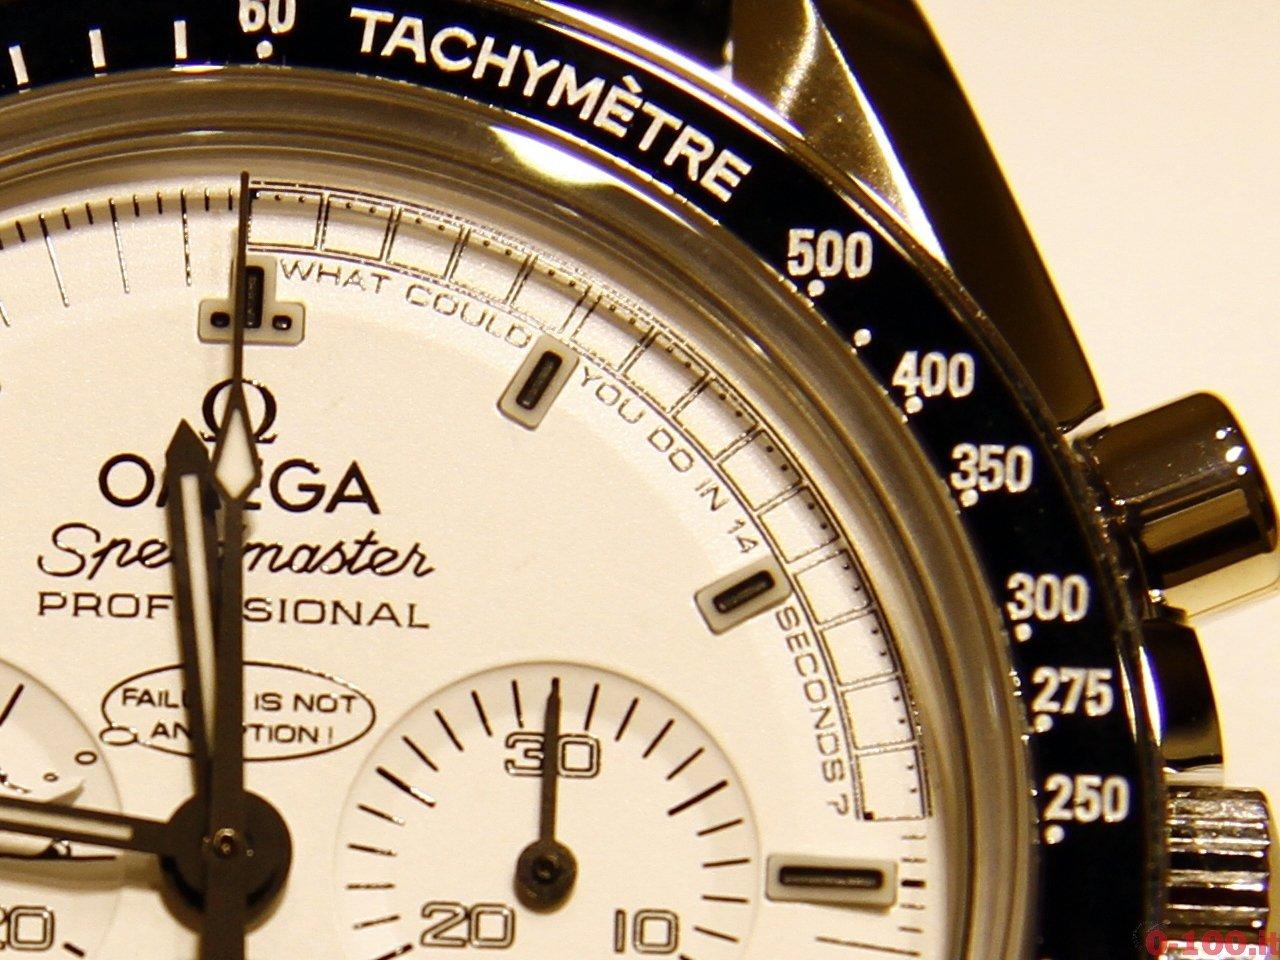 baselworld-2015-omega-speedmaster-moonwatch-apollo-14-snoopy-0-100_6